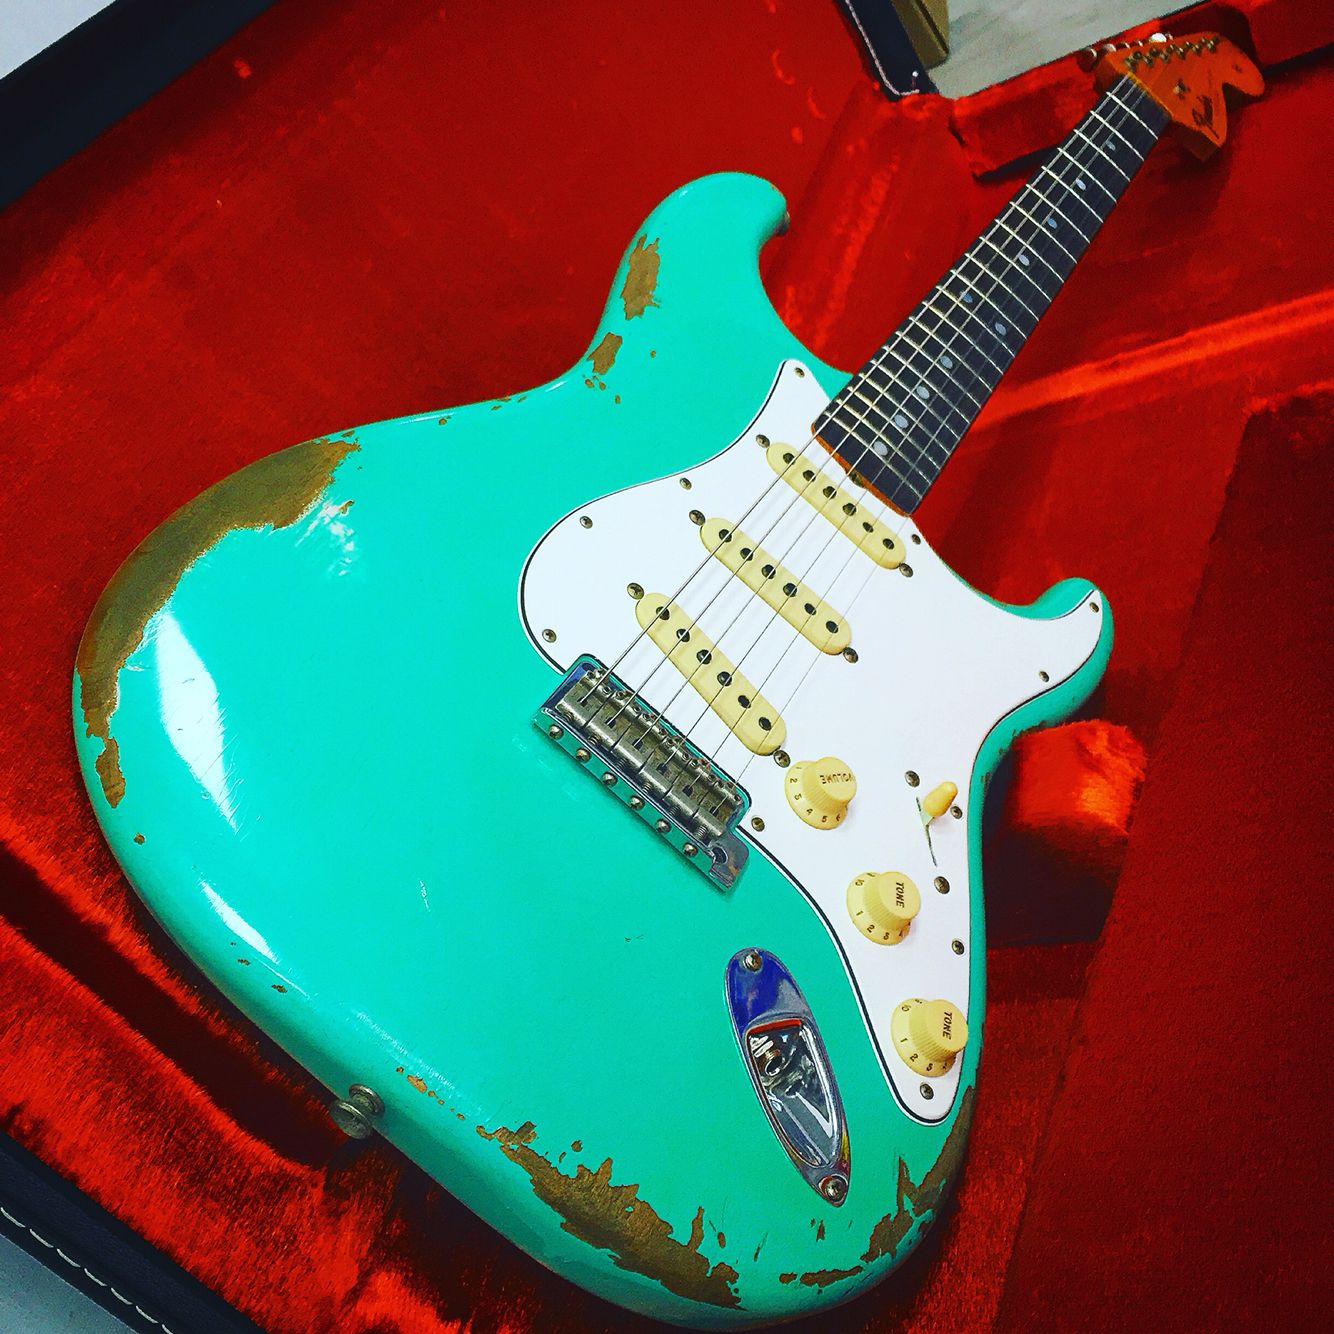 fender heavy relic 1967 stratocaster in sea foam green guitars fender custom shop fender. Black Bedroom Furniture Sets. Home Design Ideas